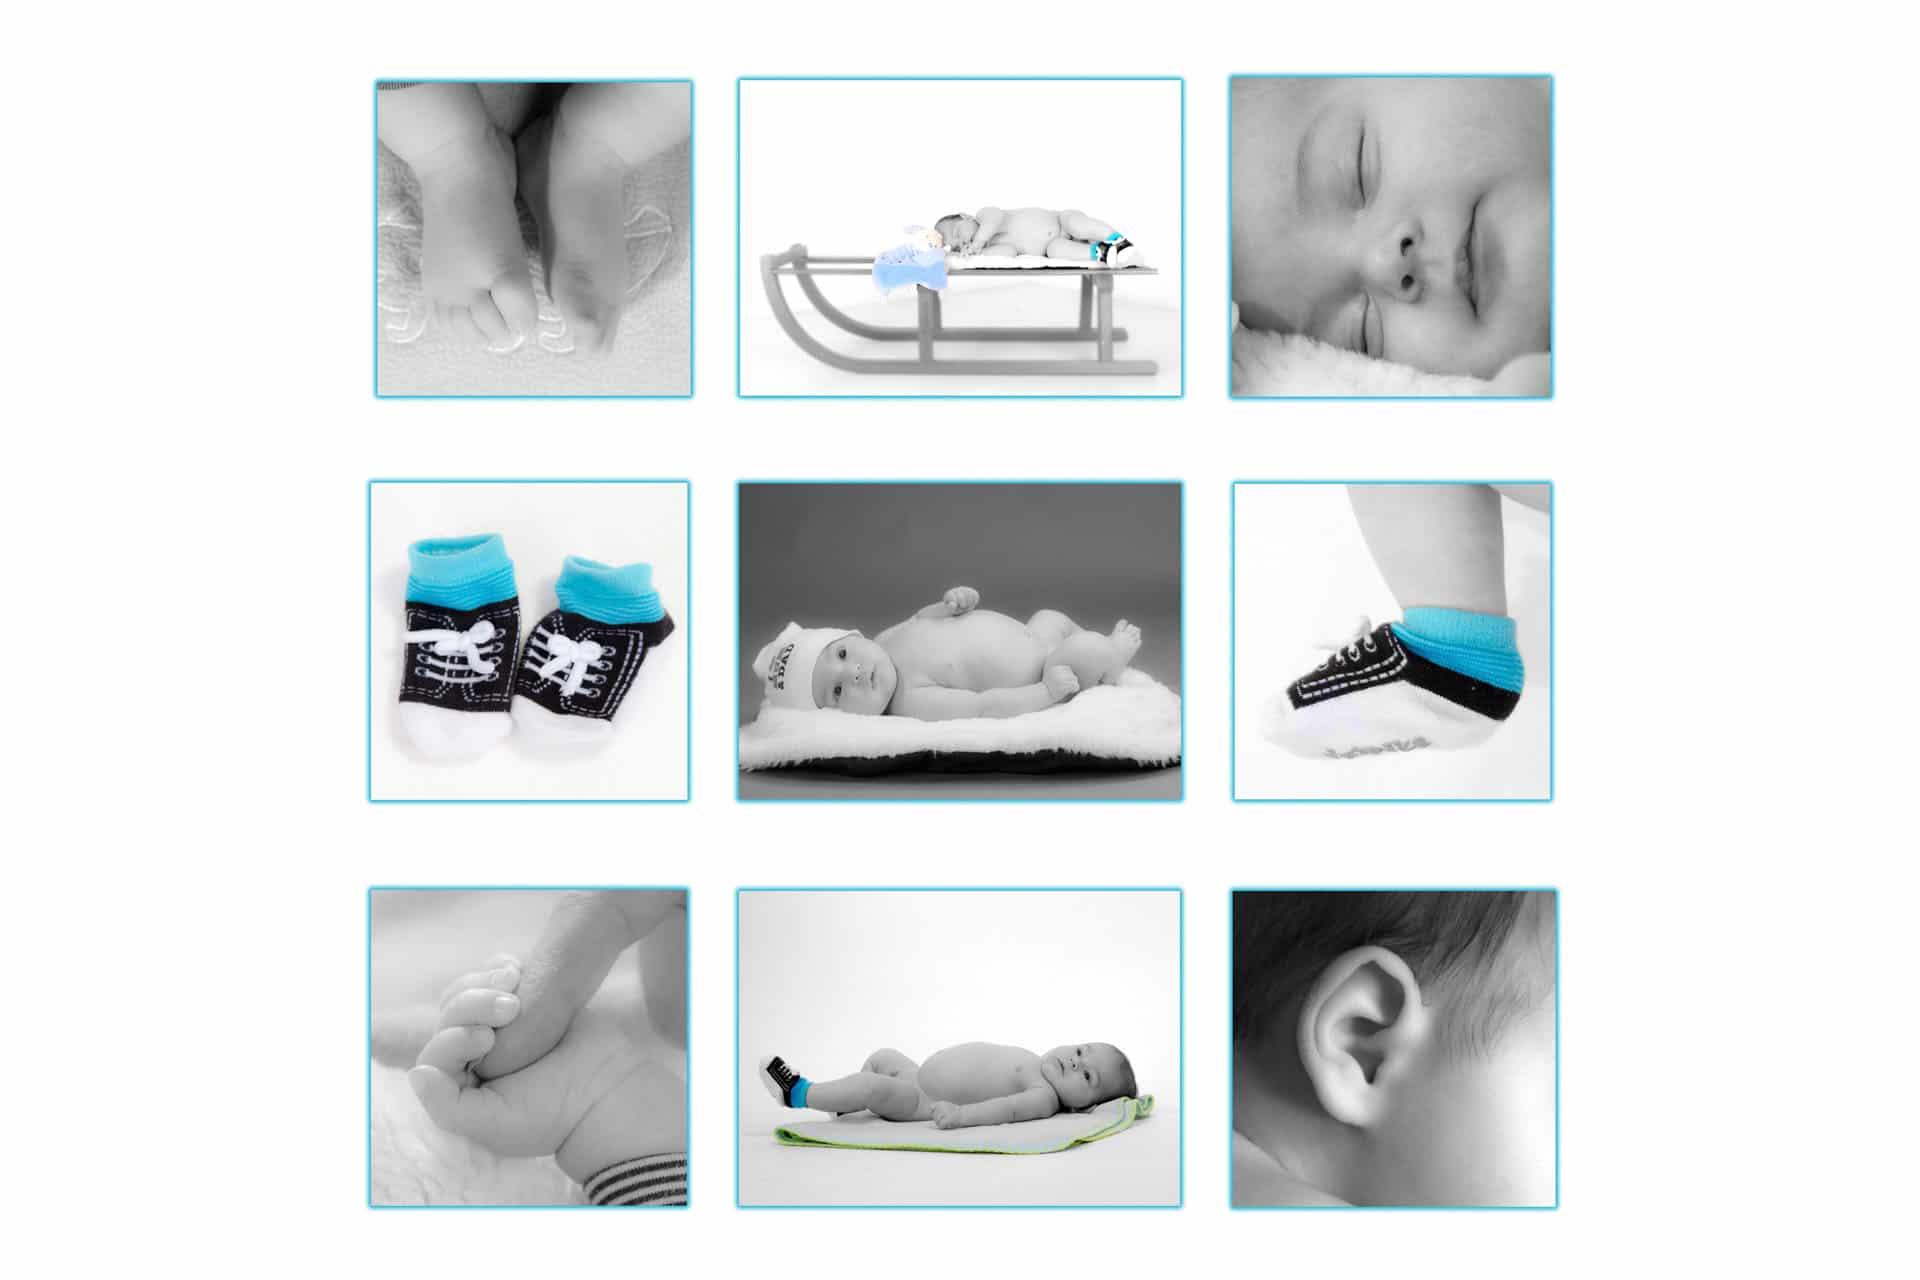 Zauberhafte Momente festhalten in Babybildern - Babyfotografie - Babyfotos - Babyfotograf - Babyshooting Murnau - Foto Stoess